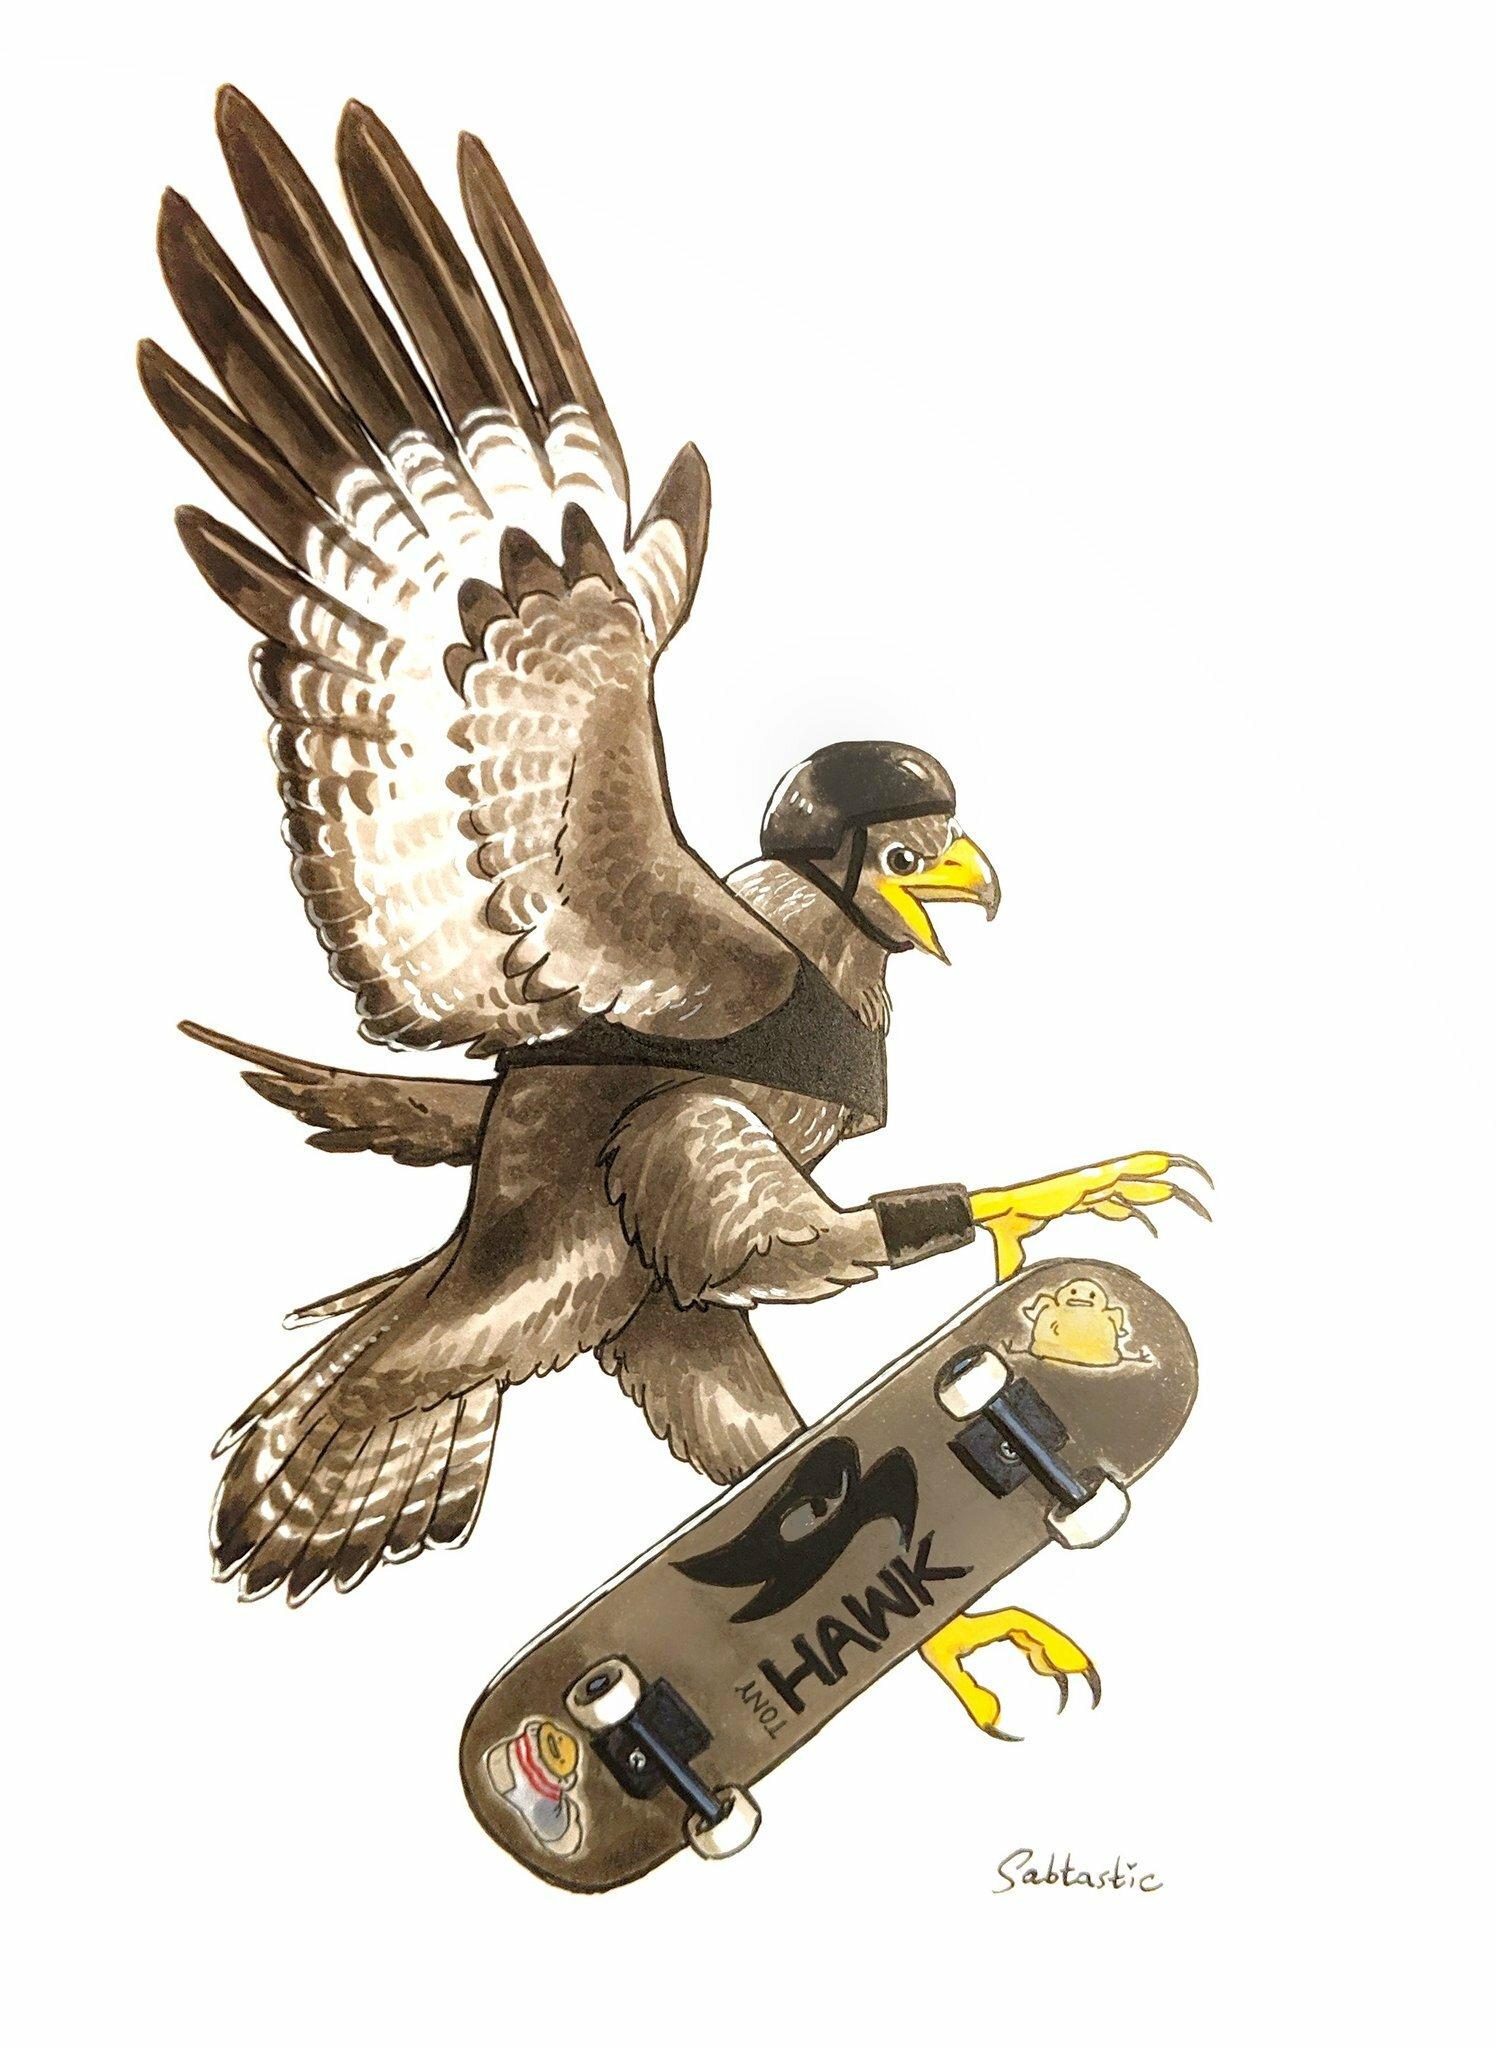 Inktober Day 21: Tony Hawk